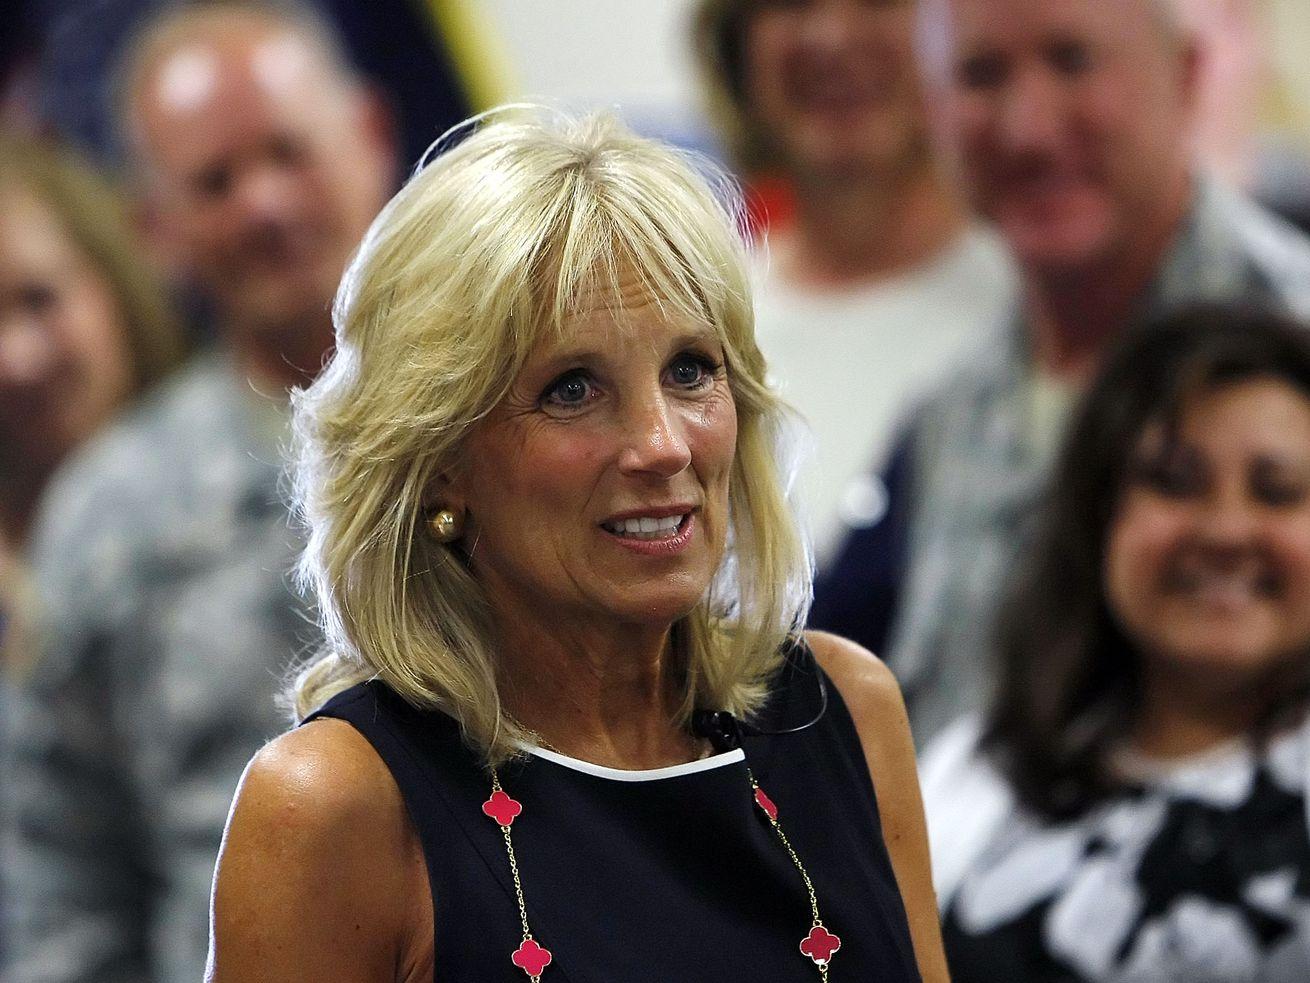 Jill Biden wife of Vice President Joe Biden stops to visit military families at the Utah National Guard base in Salt Lake City July 10, 2012.